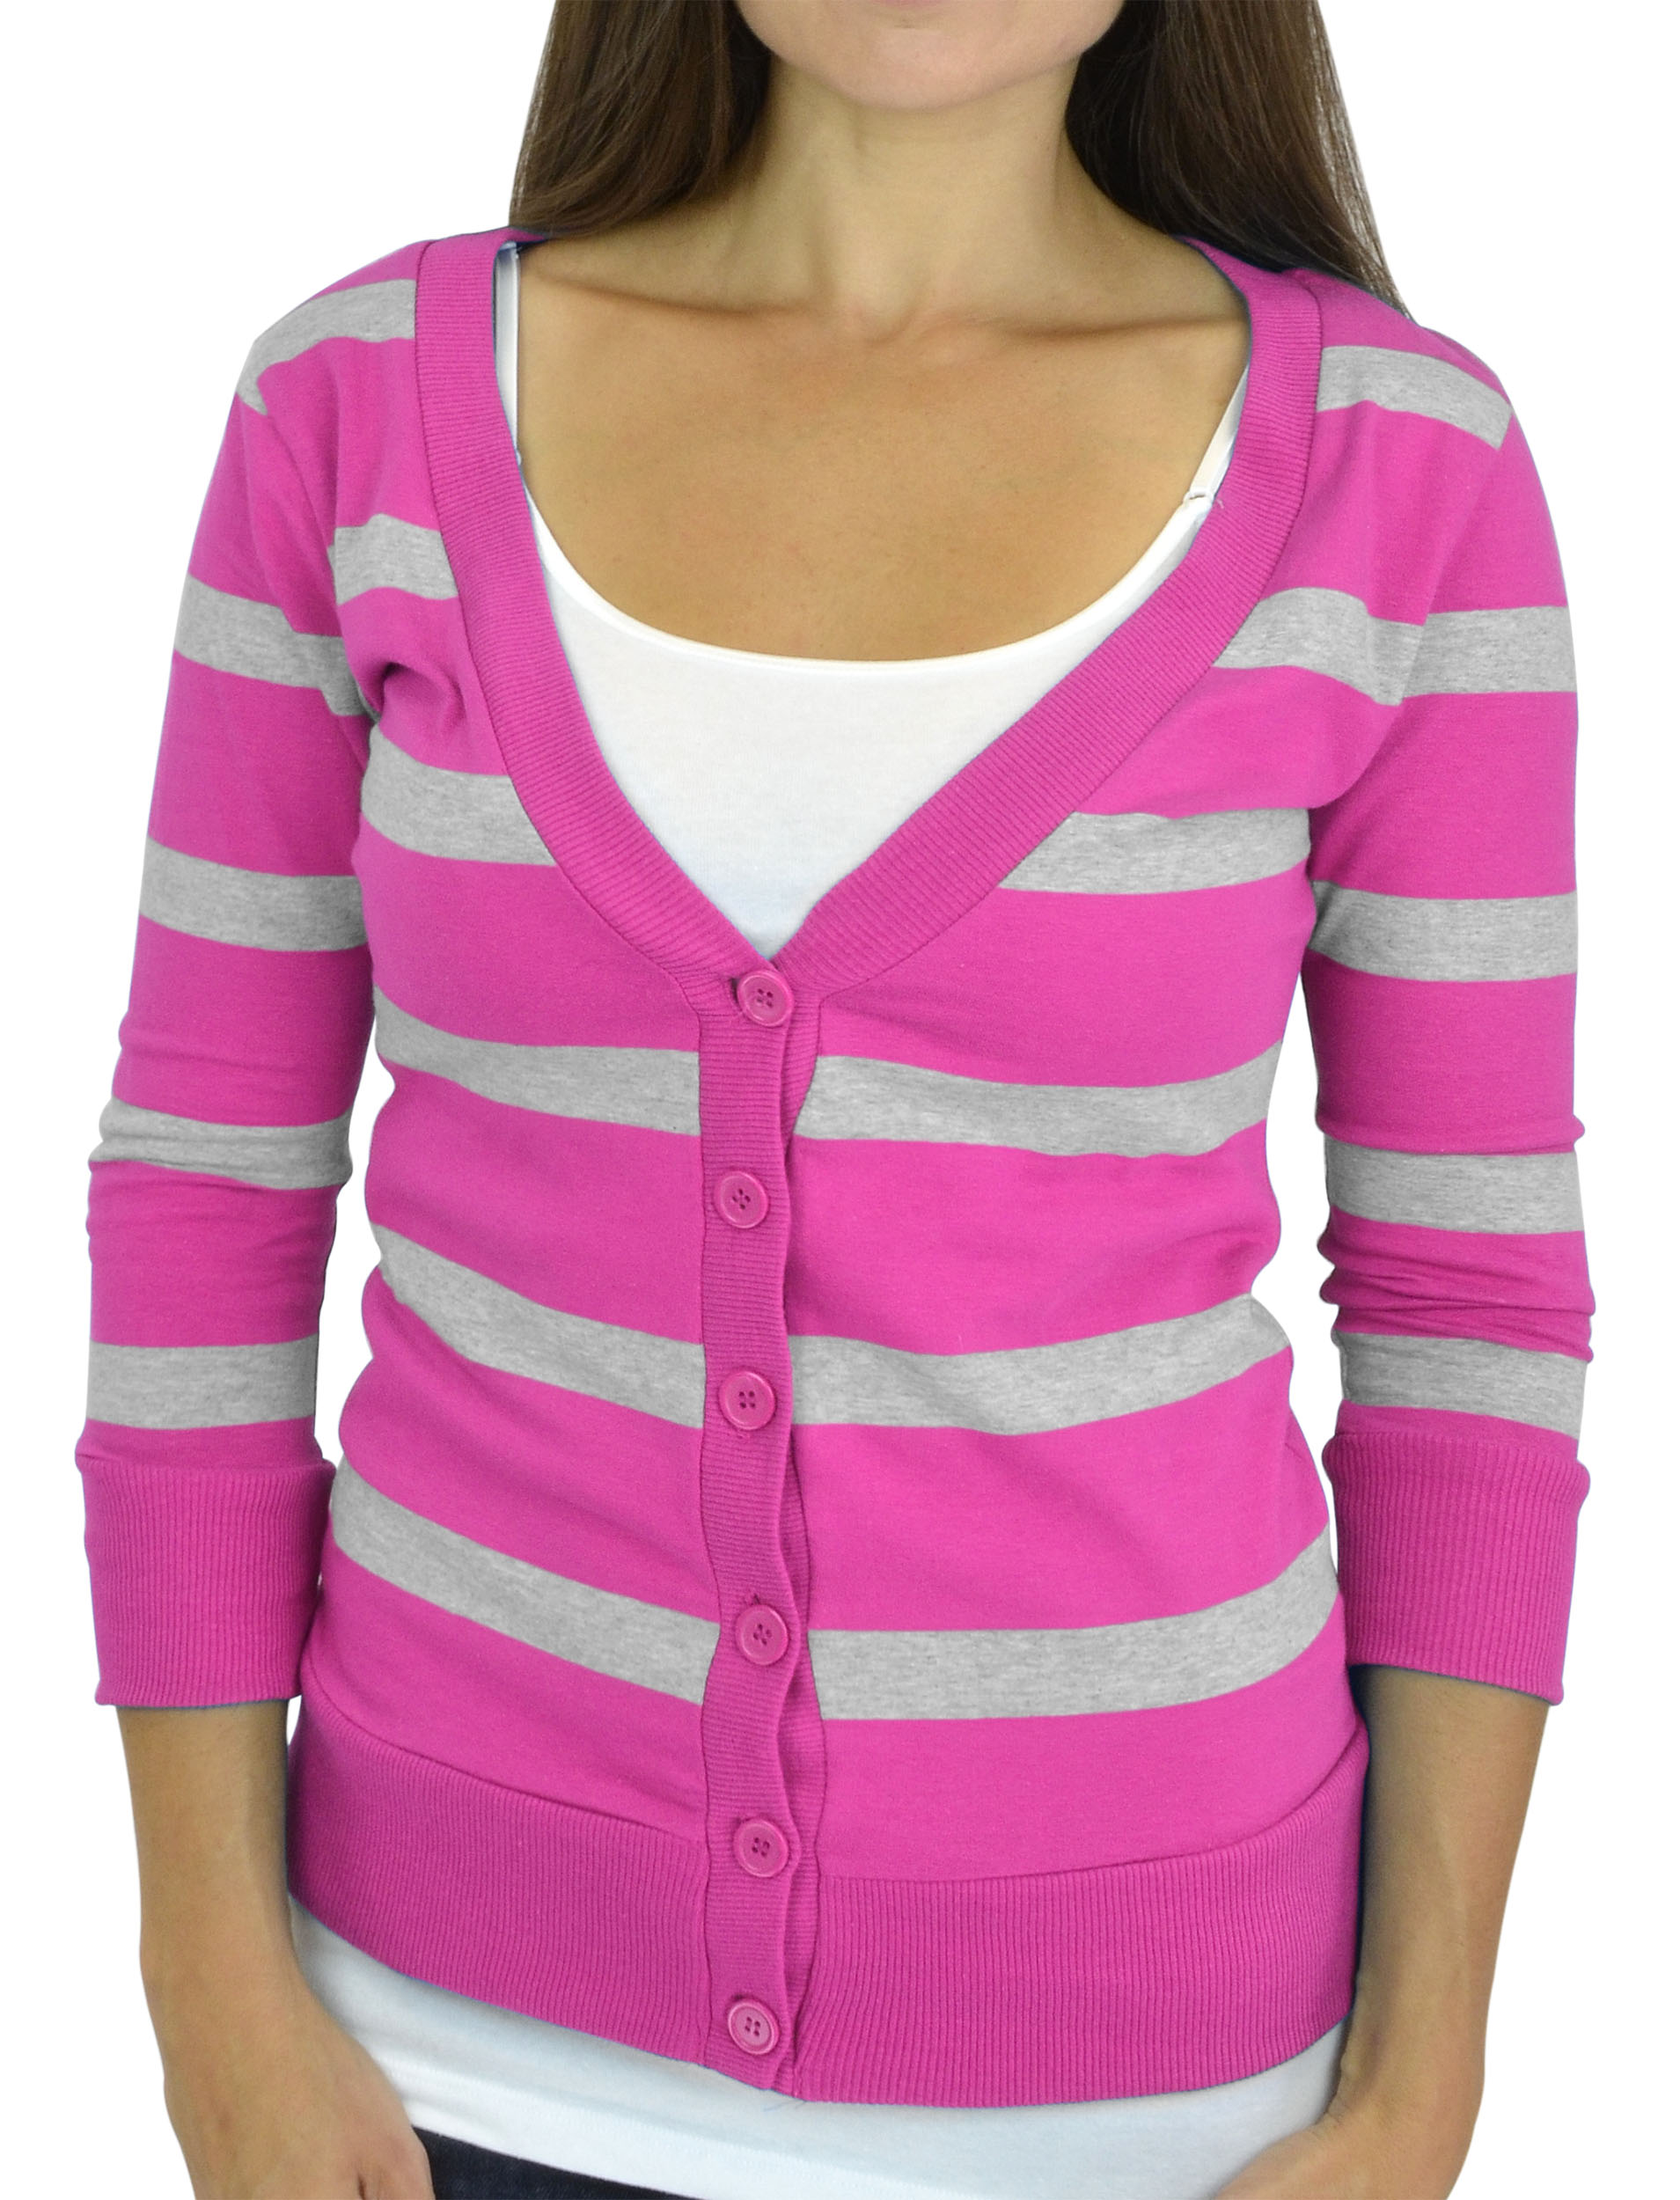 Belle Donne - Women / Girl Junior Size Soft 3/4 Sleeve V-Neck Sweater Cardigans - /Large